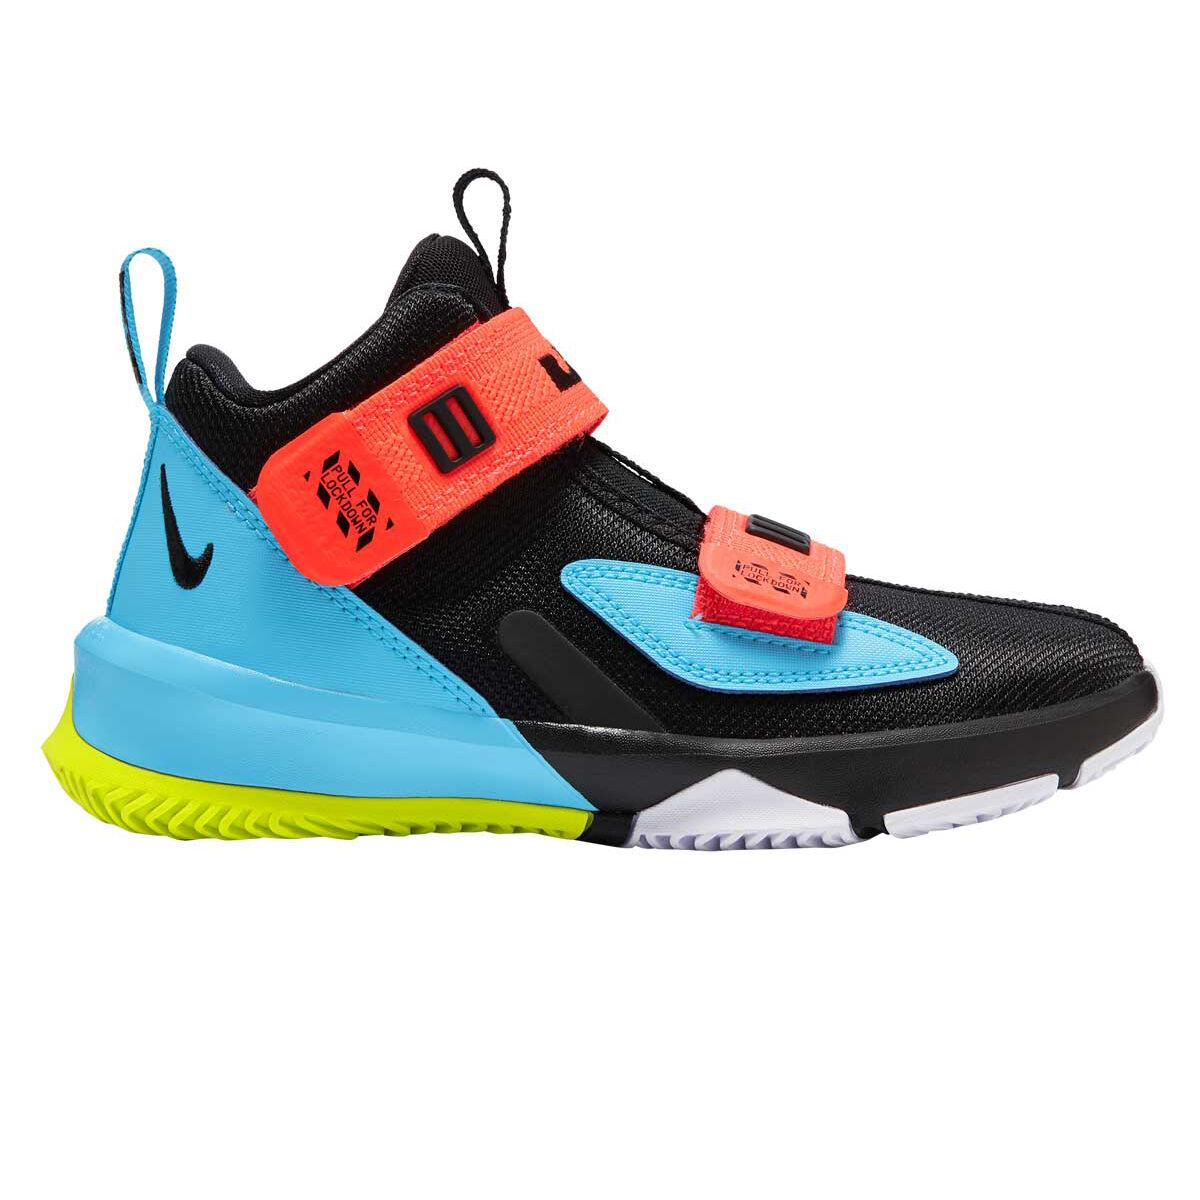 Nike LeBron Soldier XIII Kids